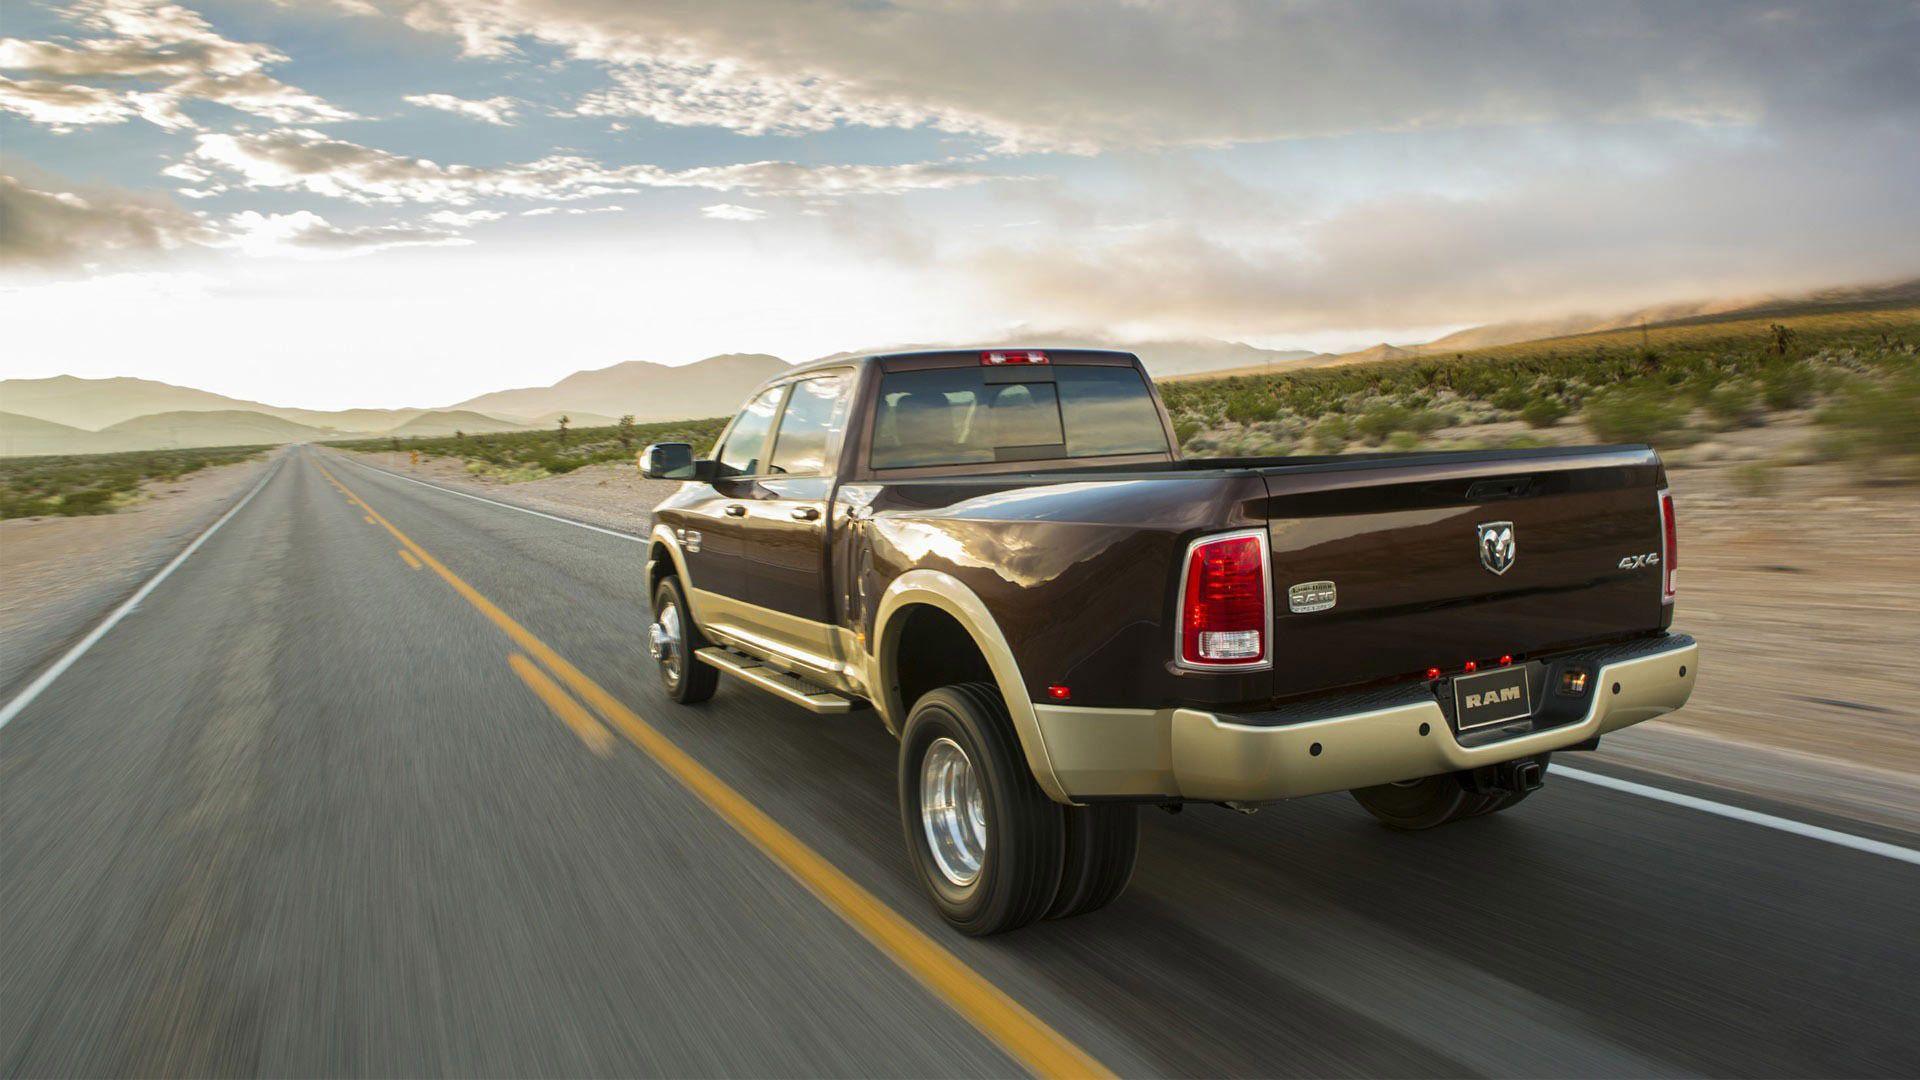 Dodge Ram free picture